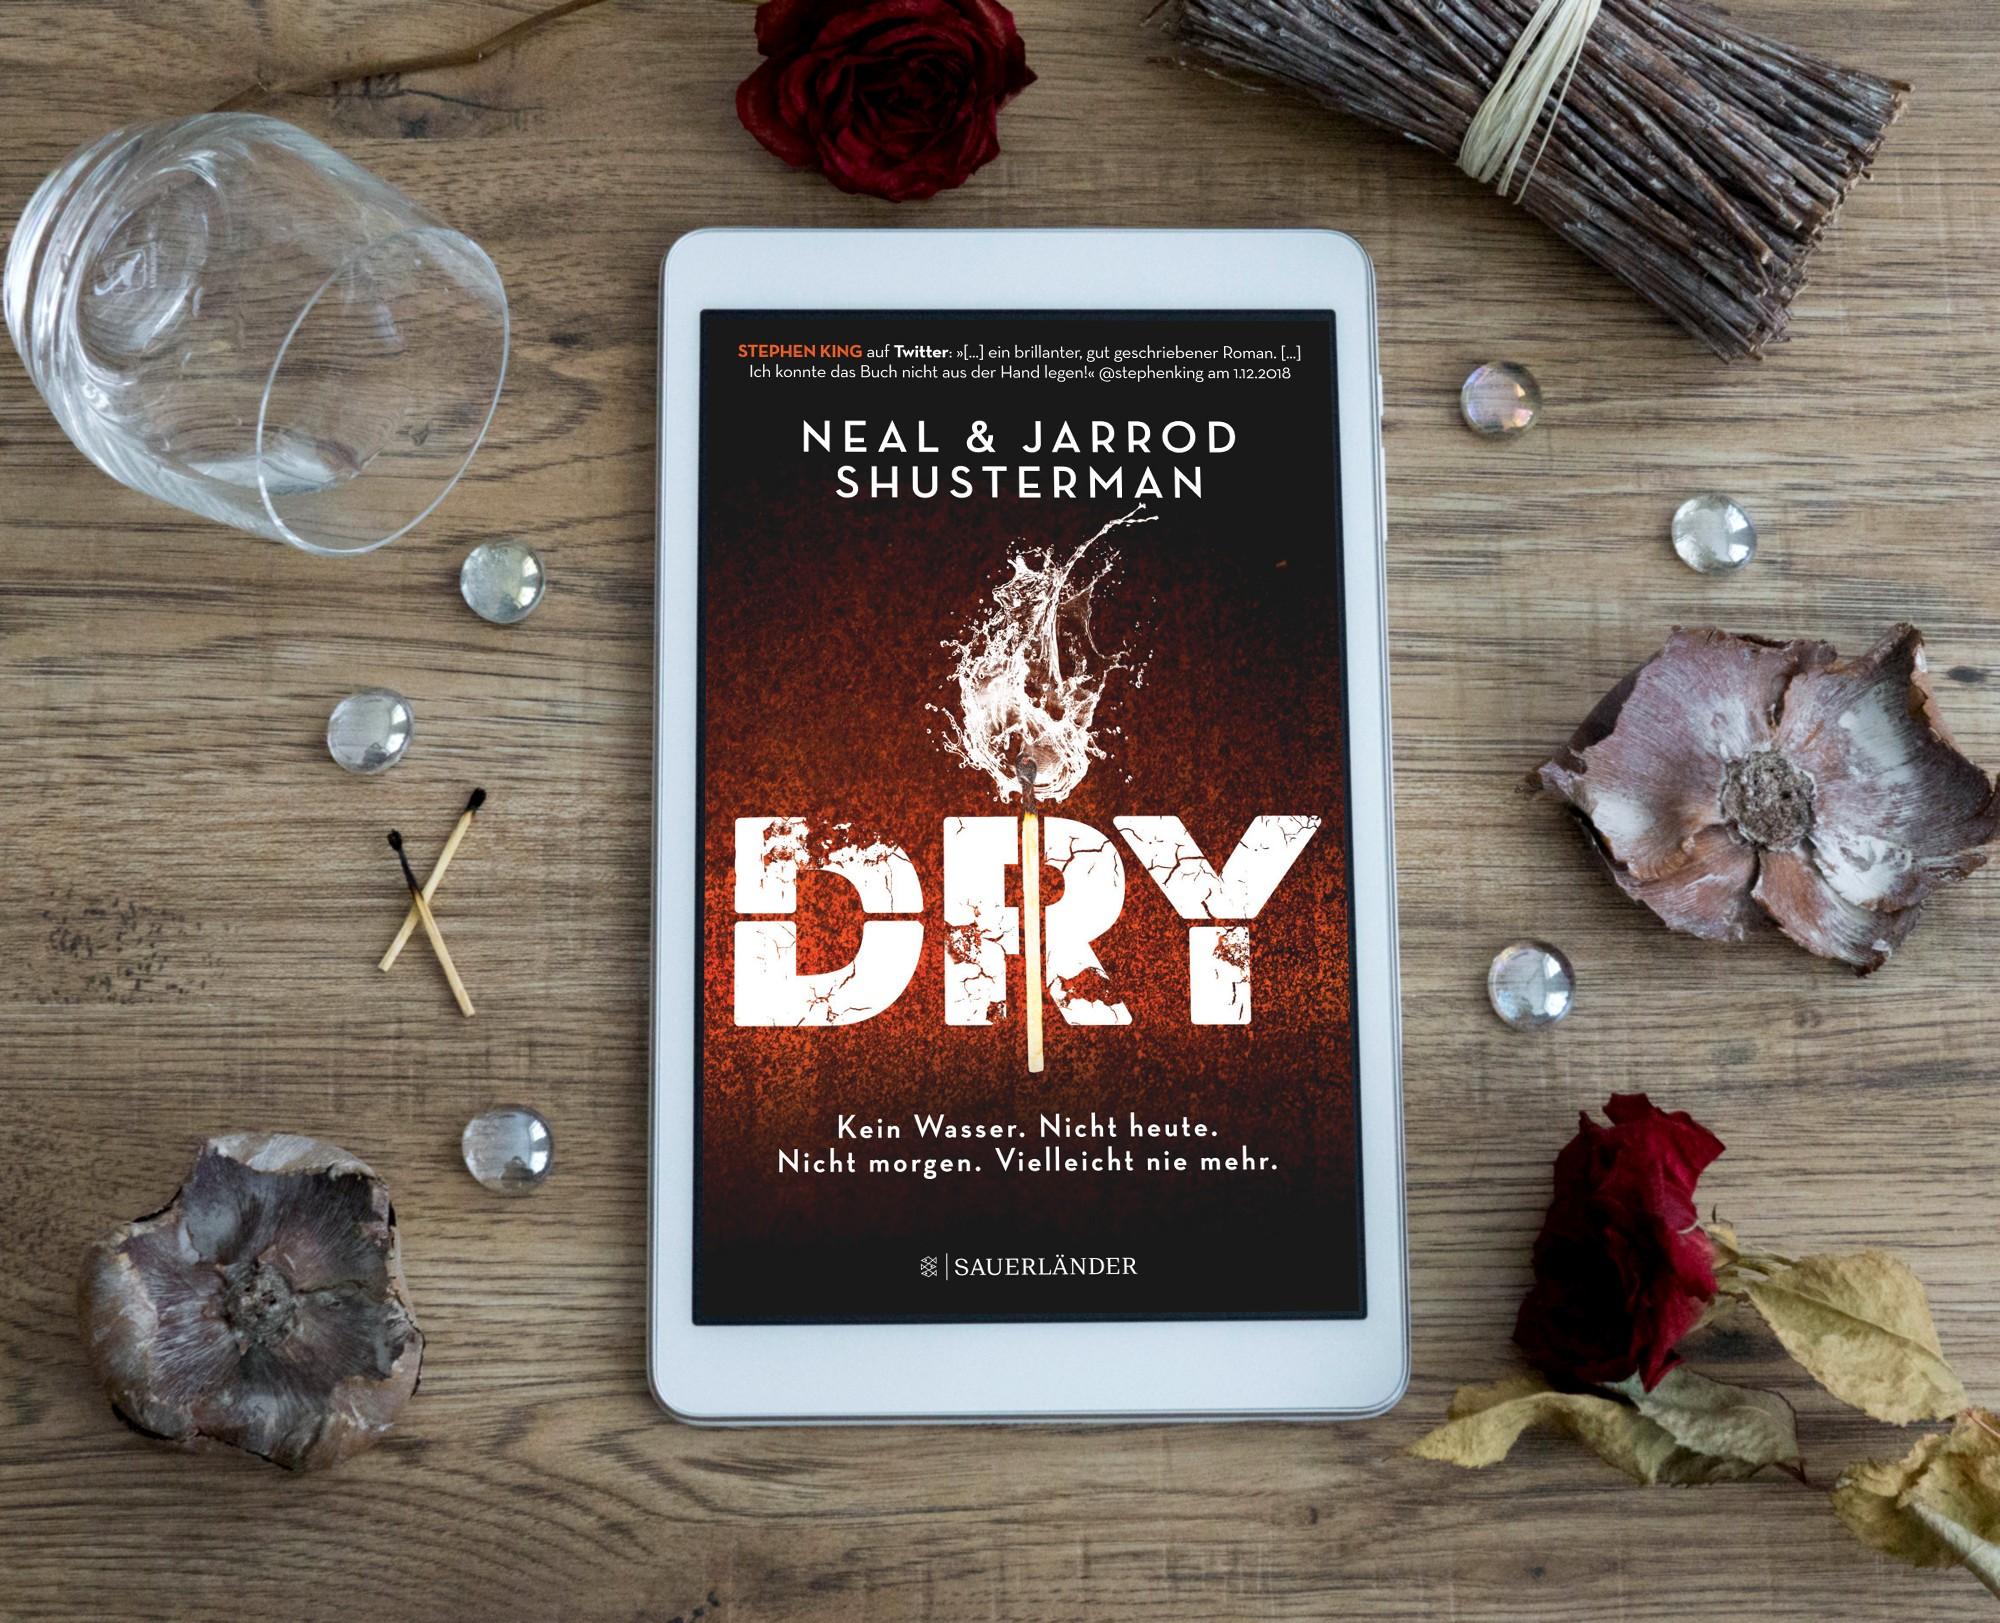 DRY – Neal und Jarrod Shusterman graphic